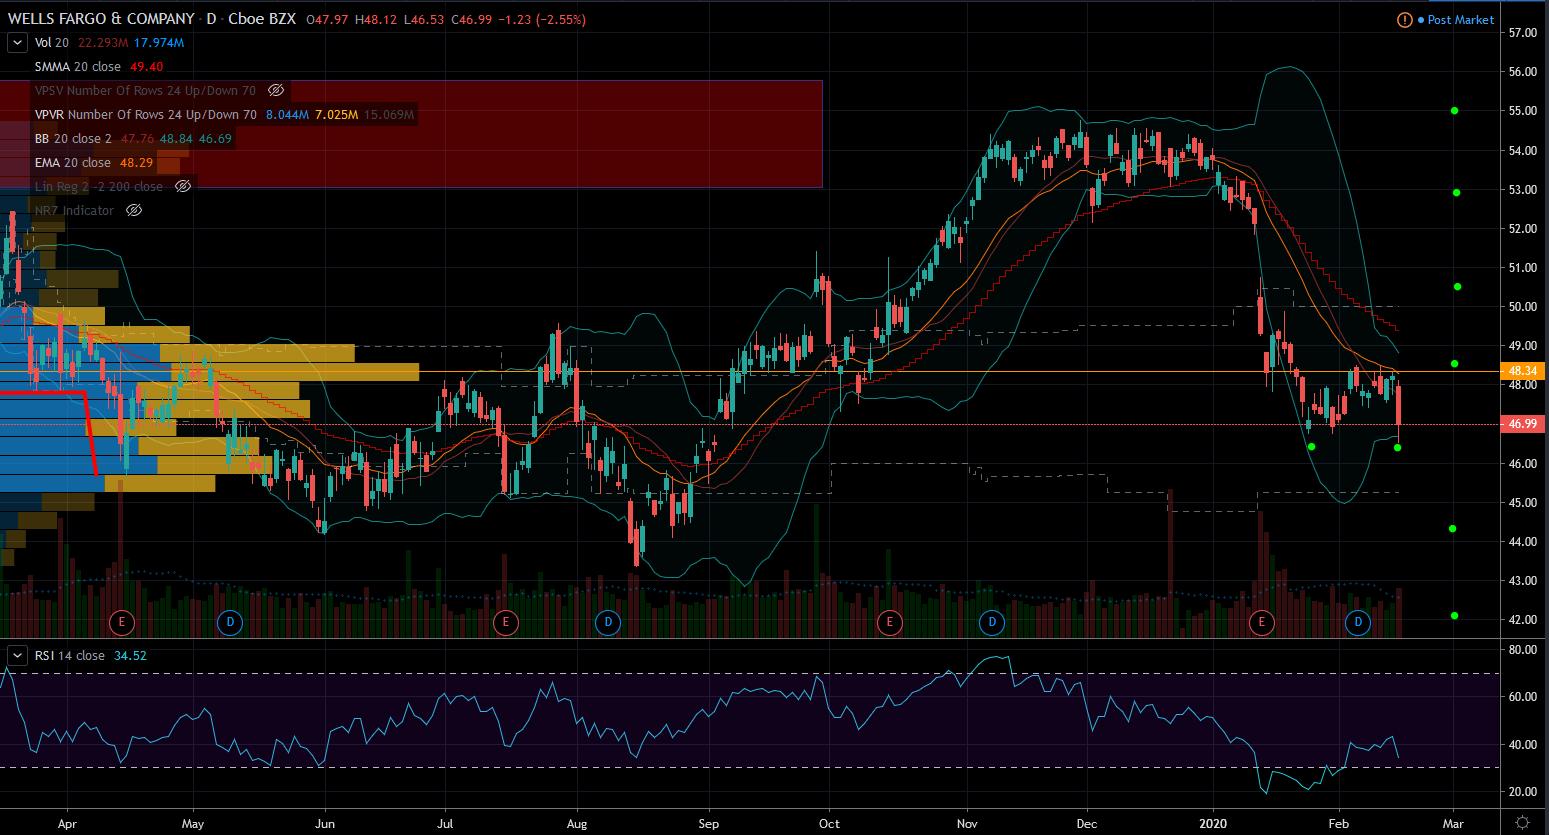 Wells Fargo Stock Chart